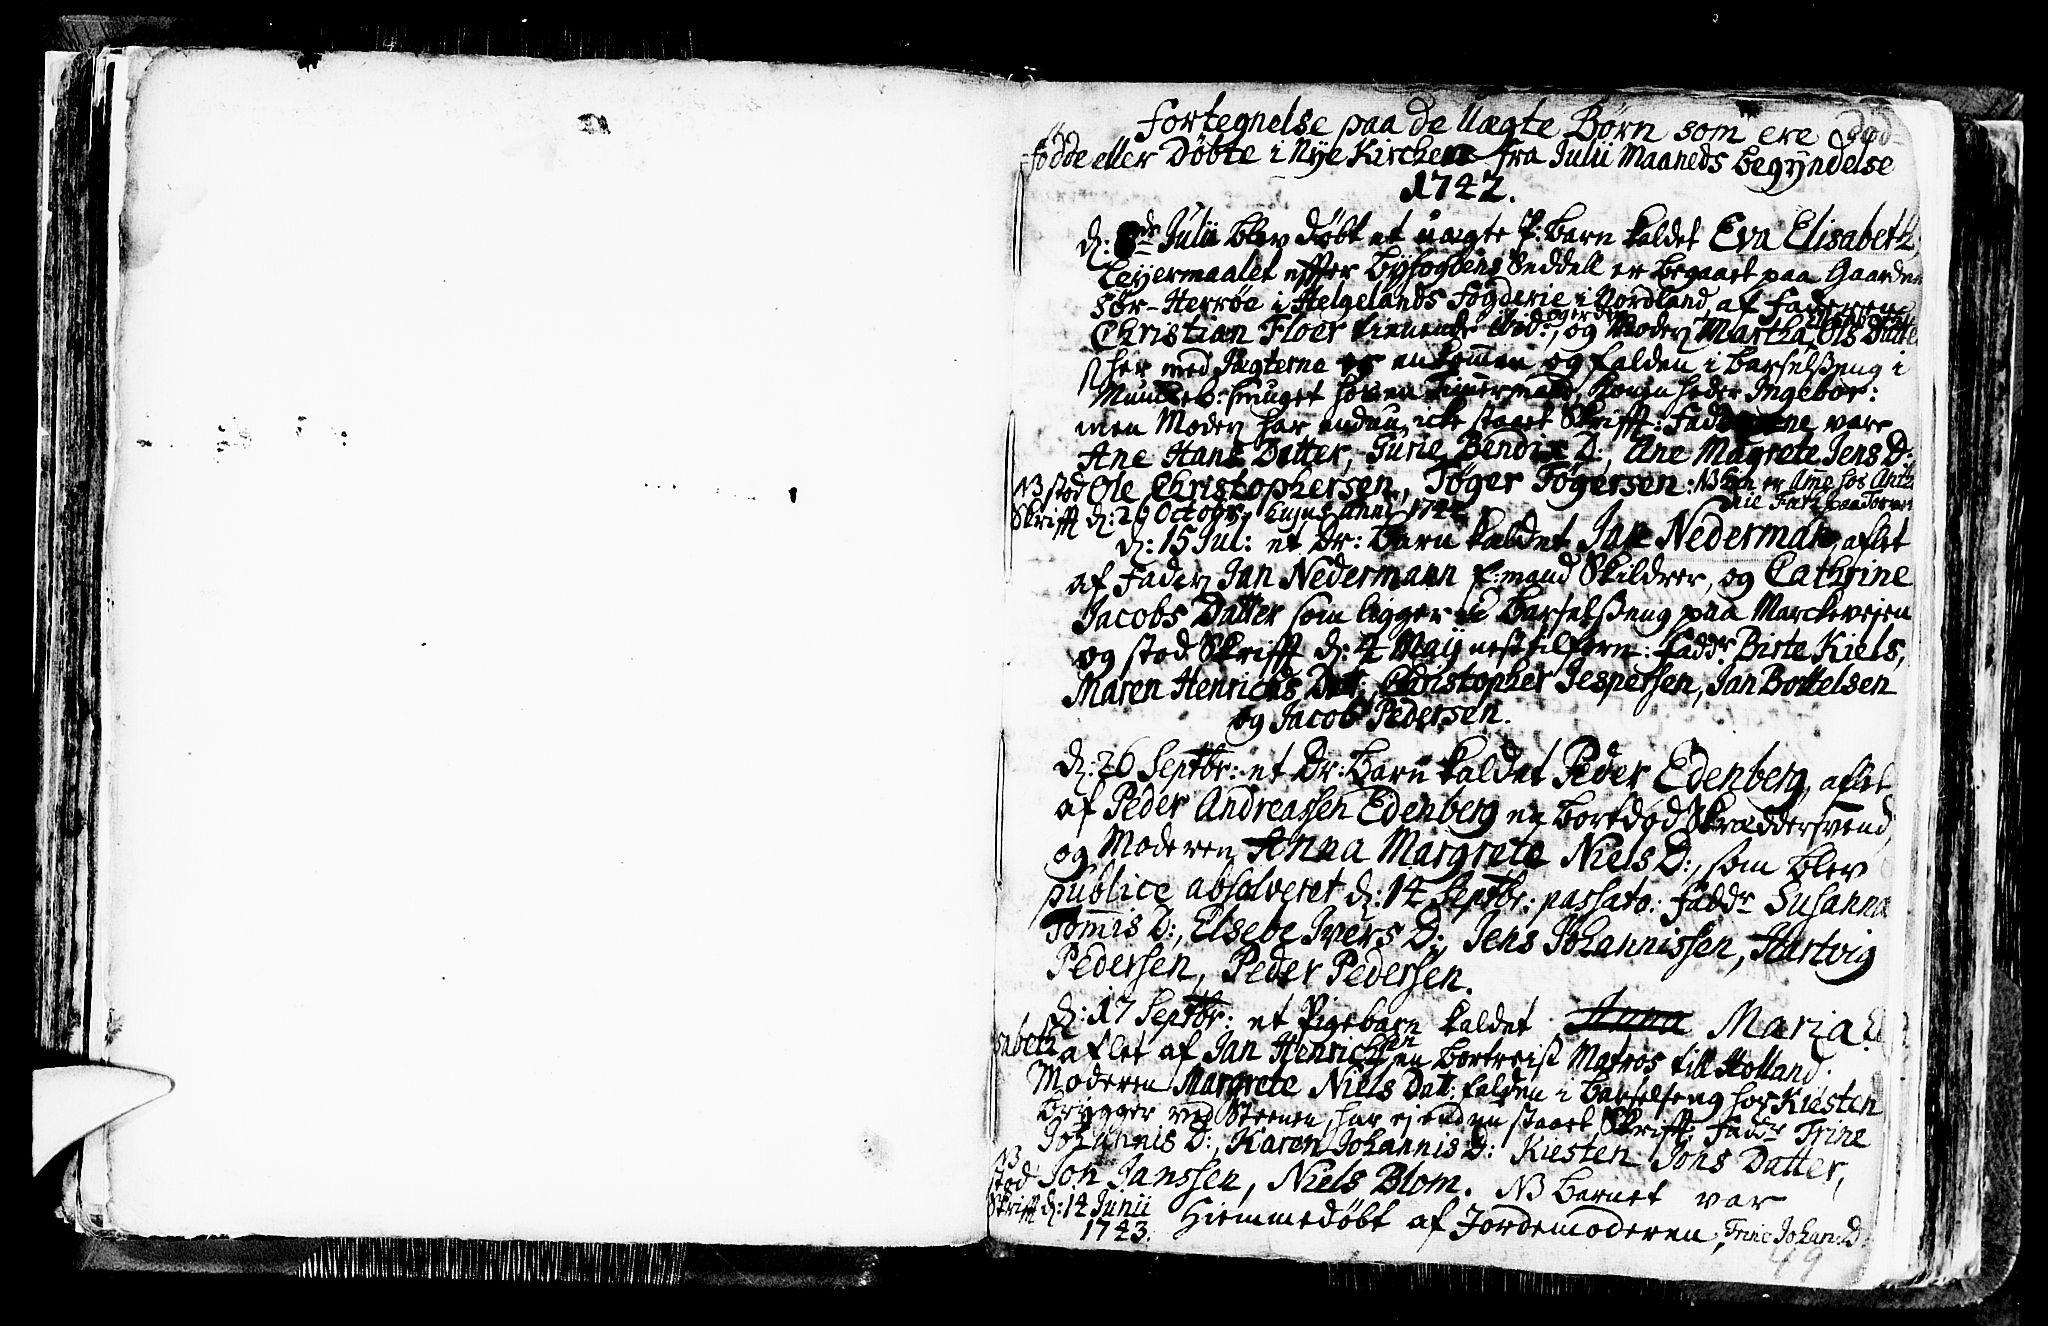 SAB, Nykirken Sokneprestembete, H/Haa: Ministerialbok nr. A 1, 1668-1820, s. 49